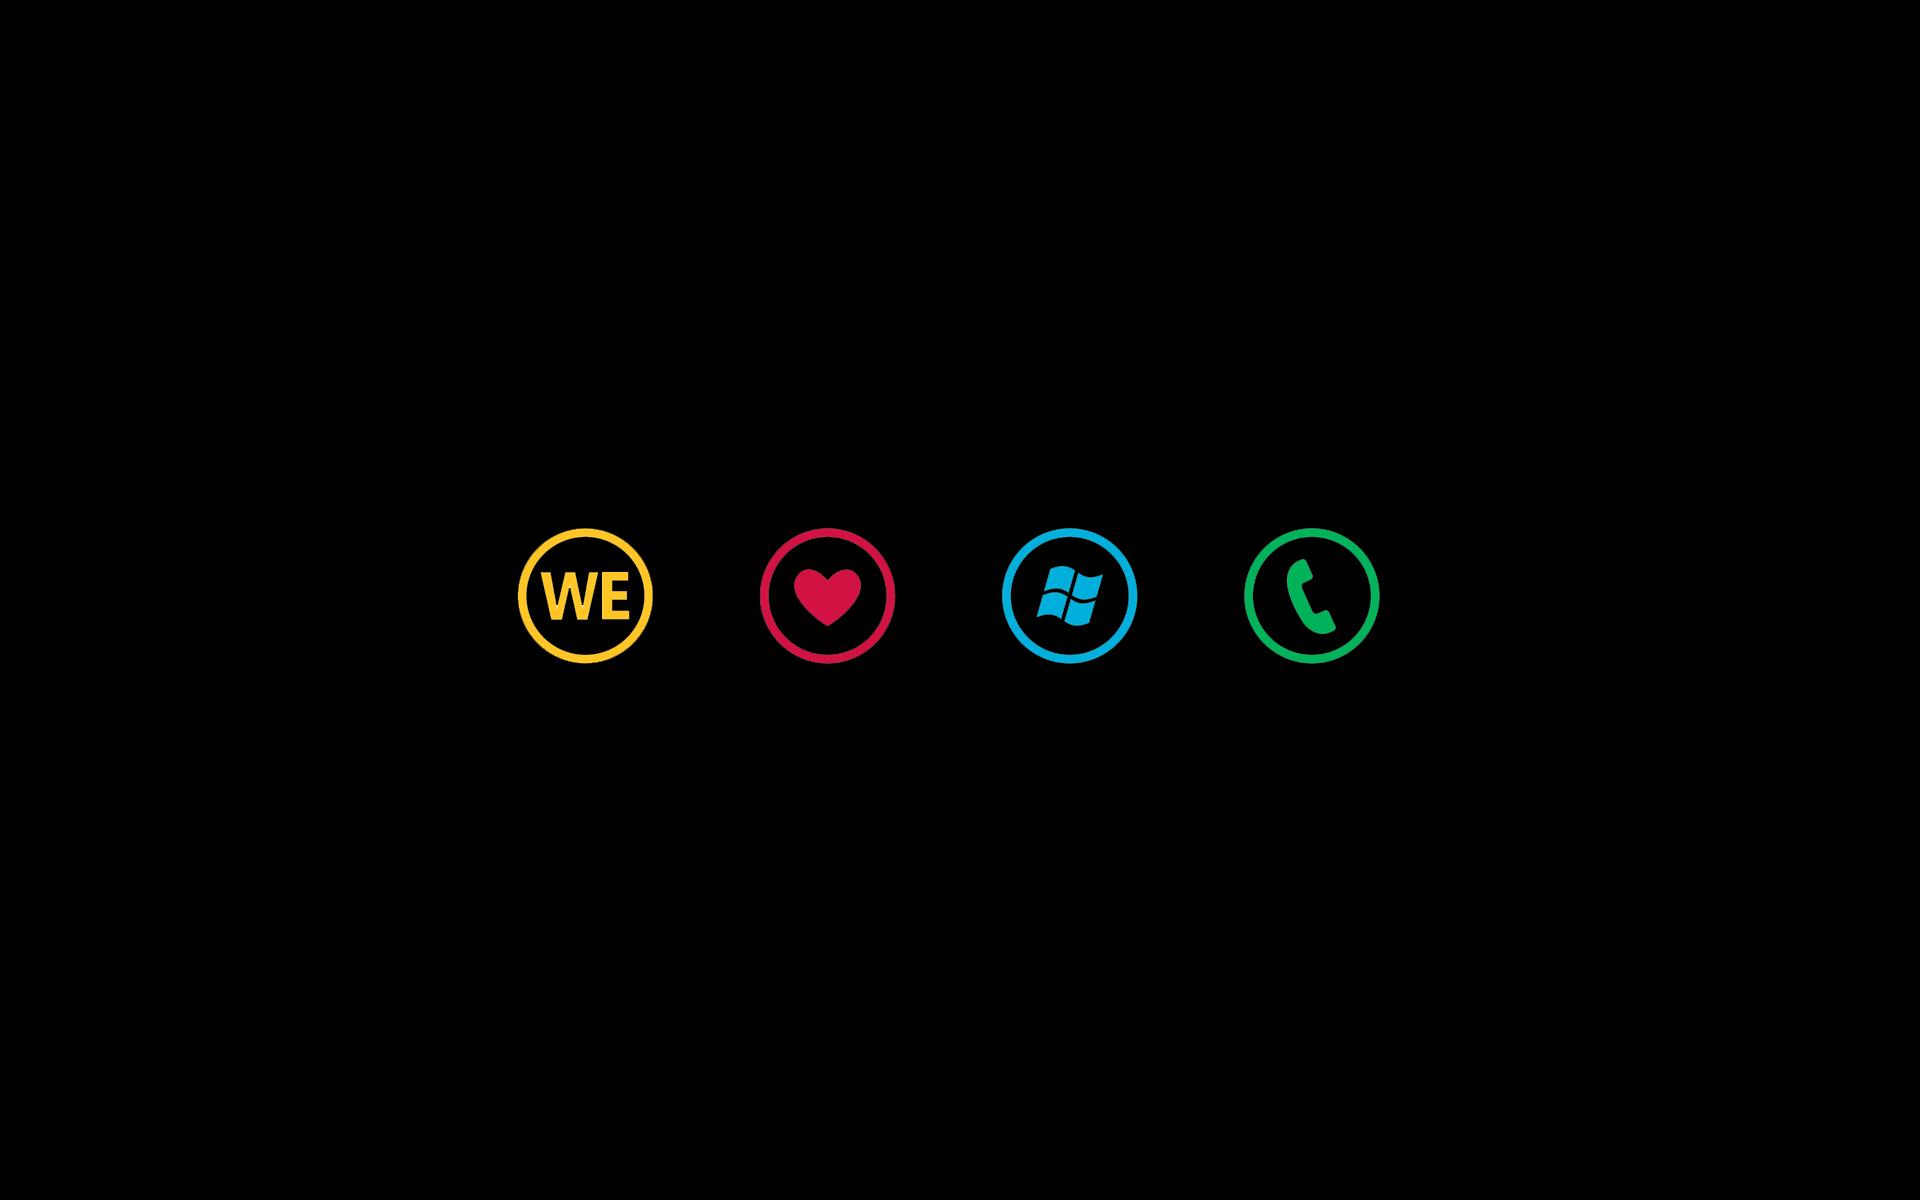 We Love Windows Phone wallpaper 36887 1920x1200